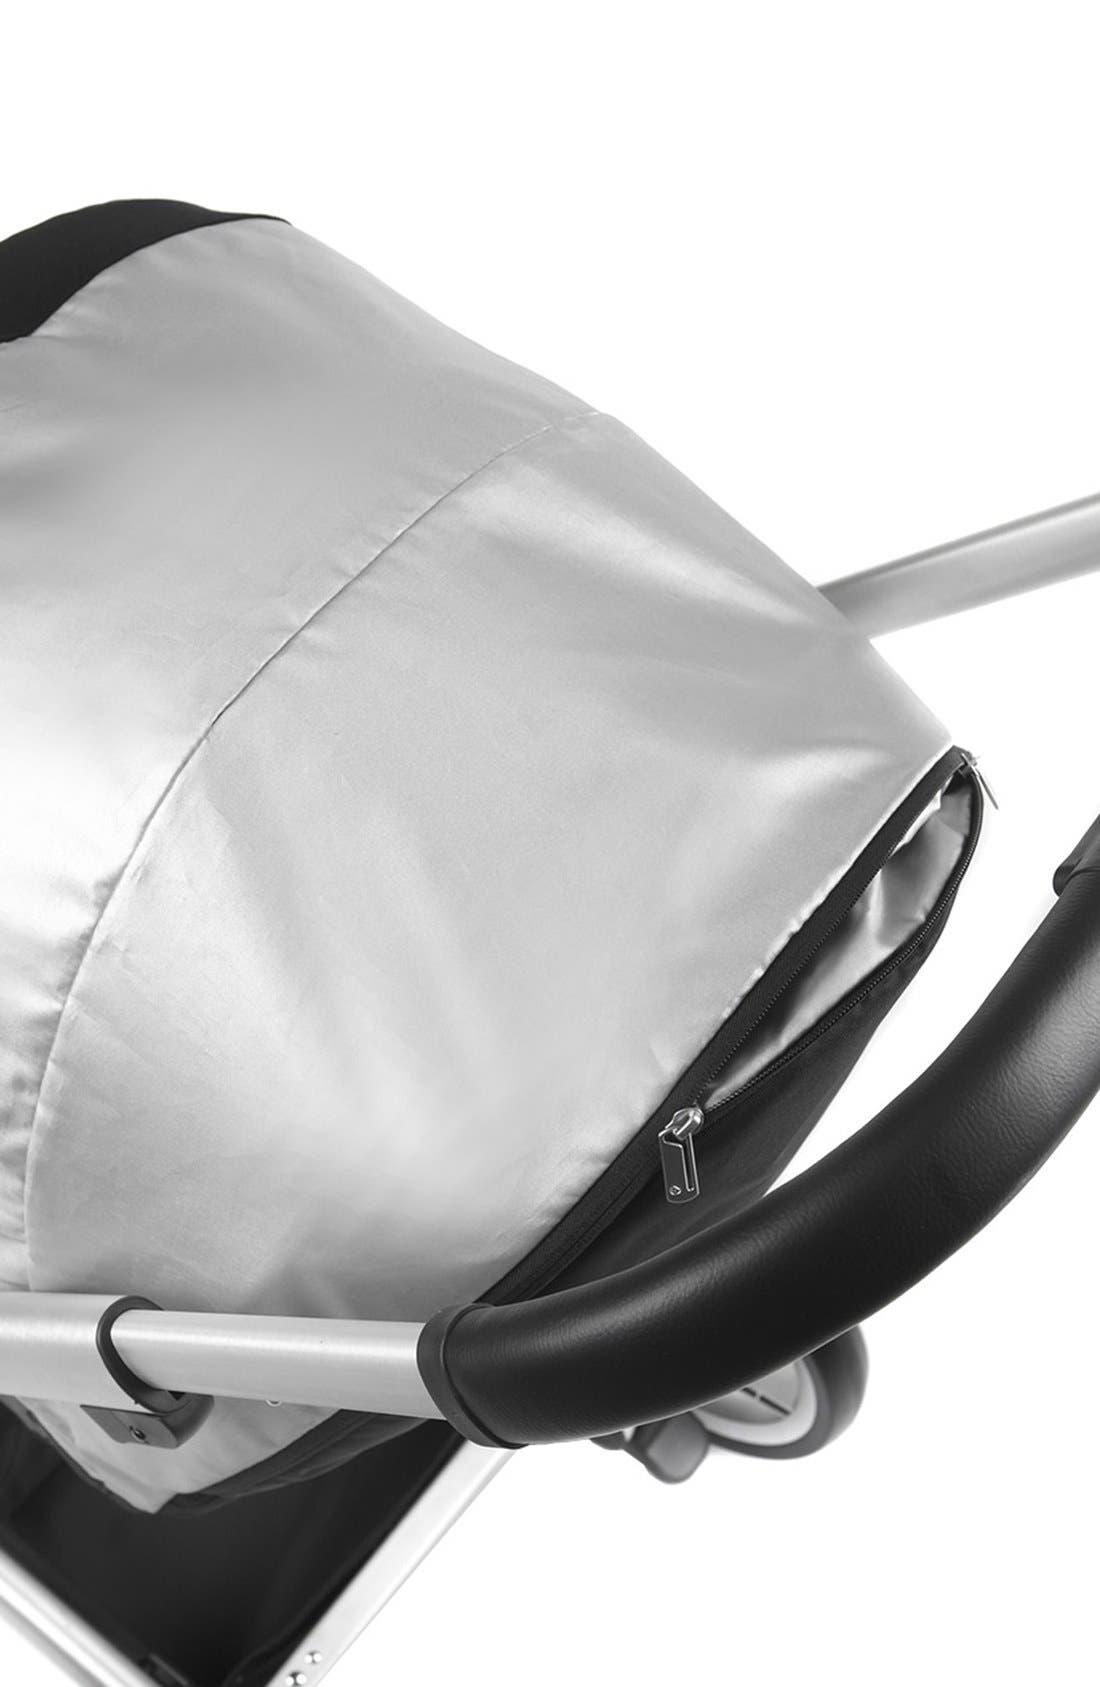 'Igo' Stroller Seat UV Cover,                             Alternate thumbnail 2, color,                             020